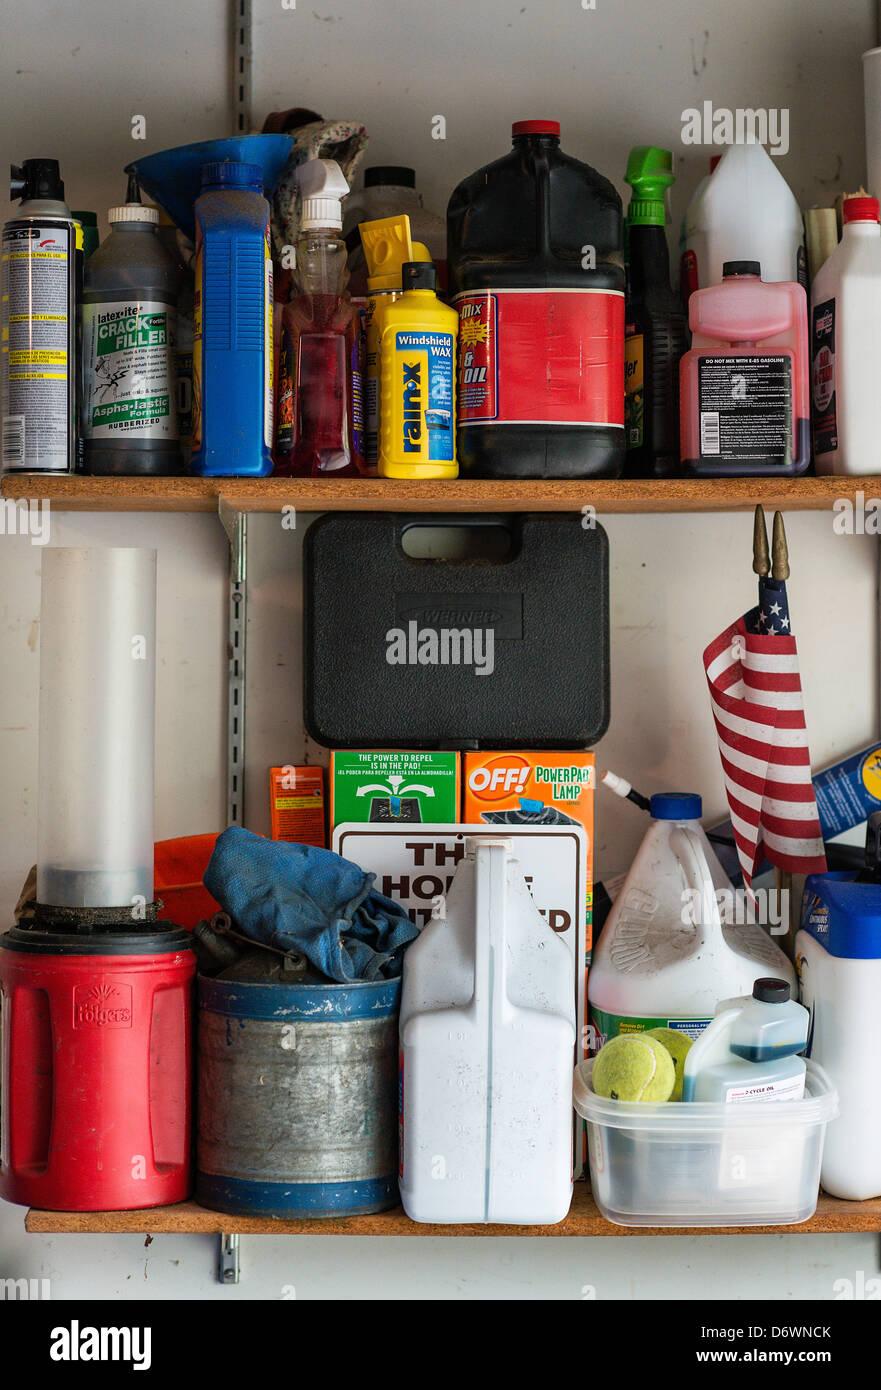 Product storage on a garage shelf. - Stock Image